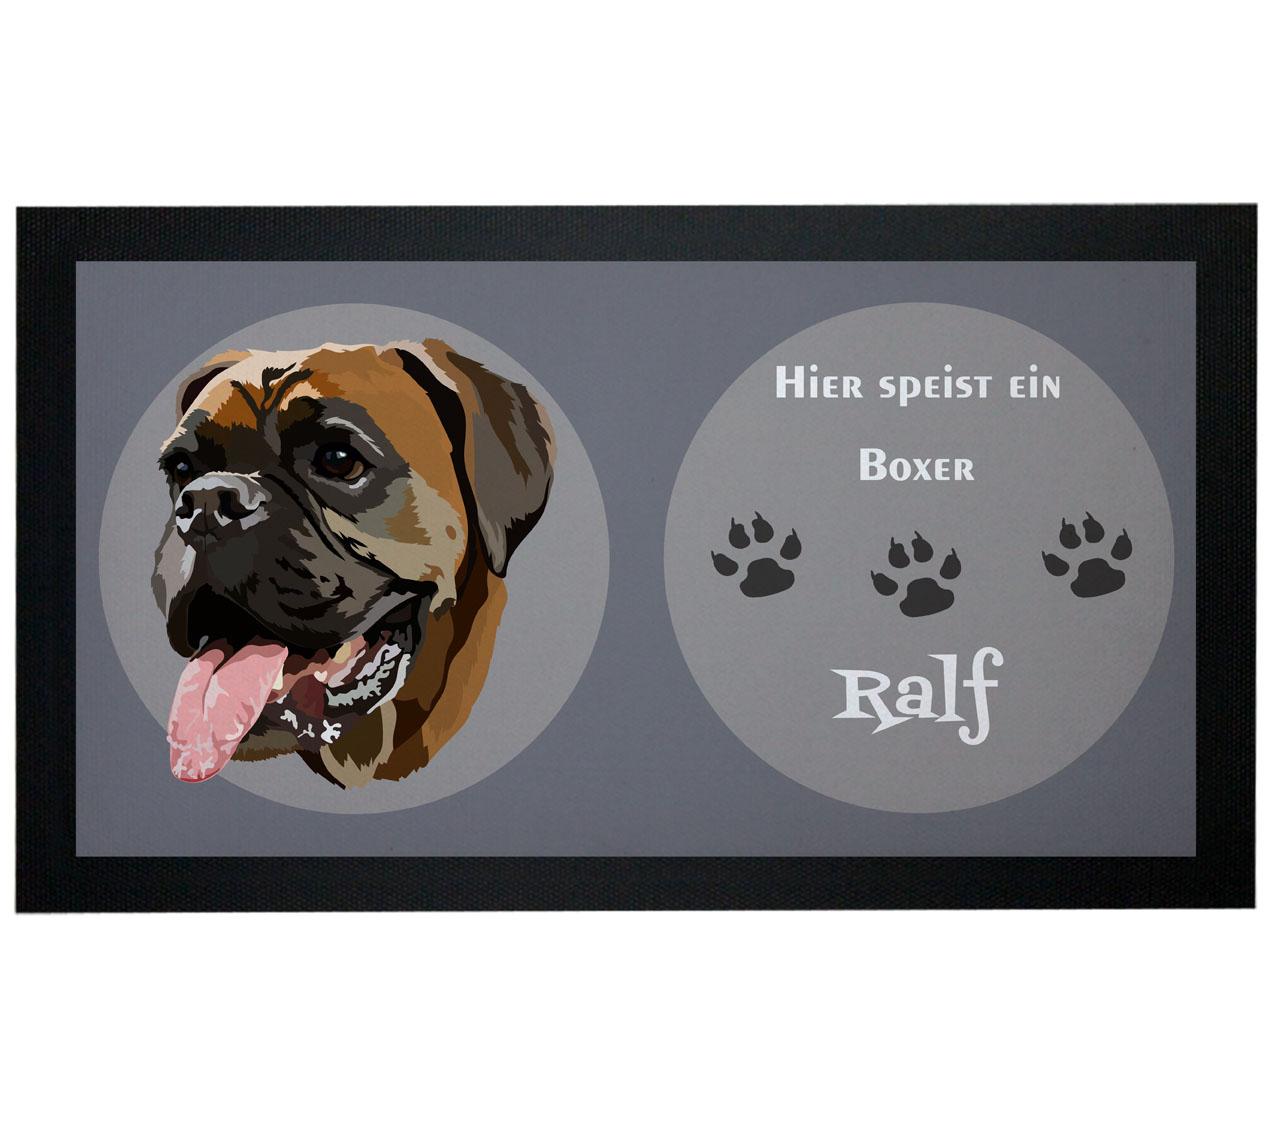 Napfunterlage Hund Boxer mit Name